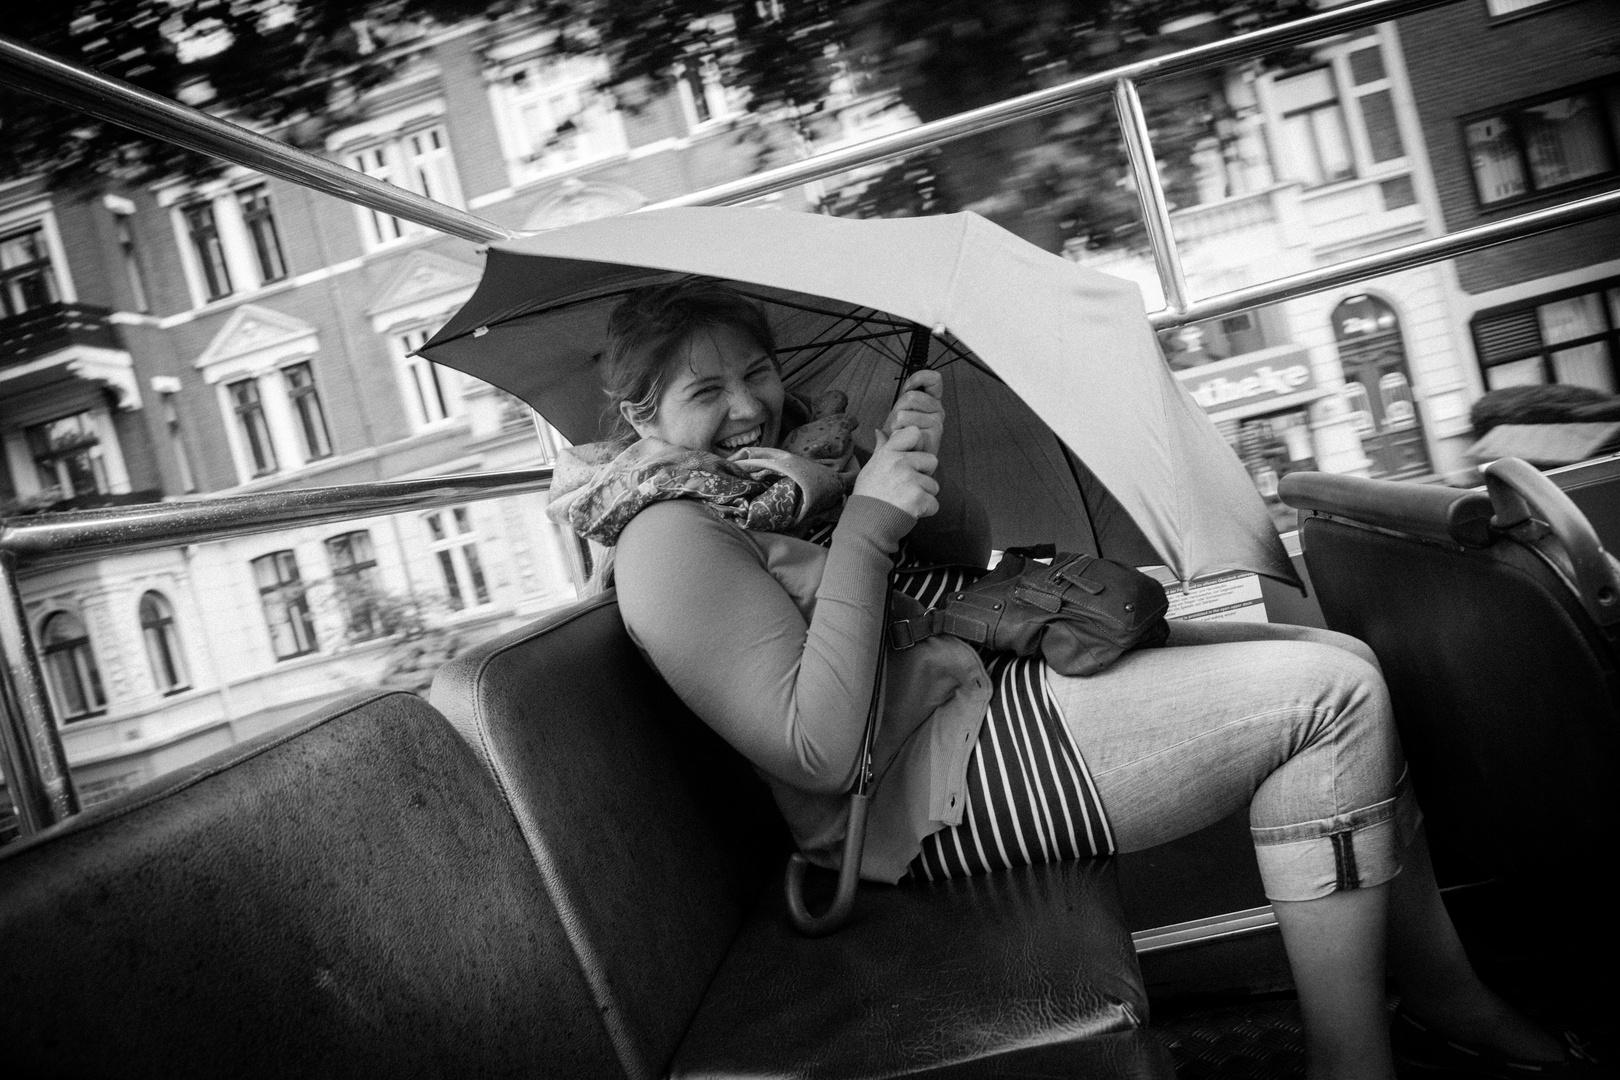 Laughin' in the rain